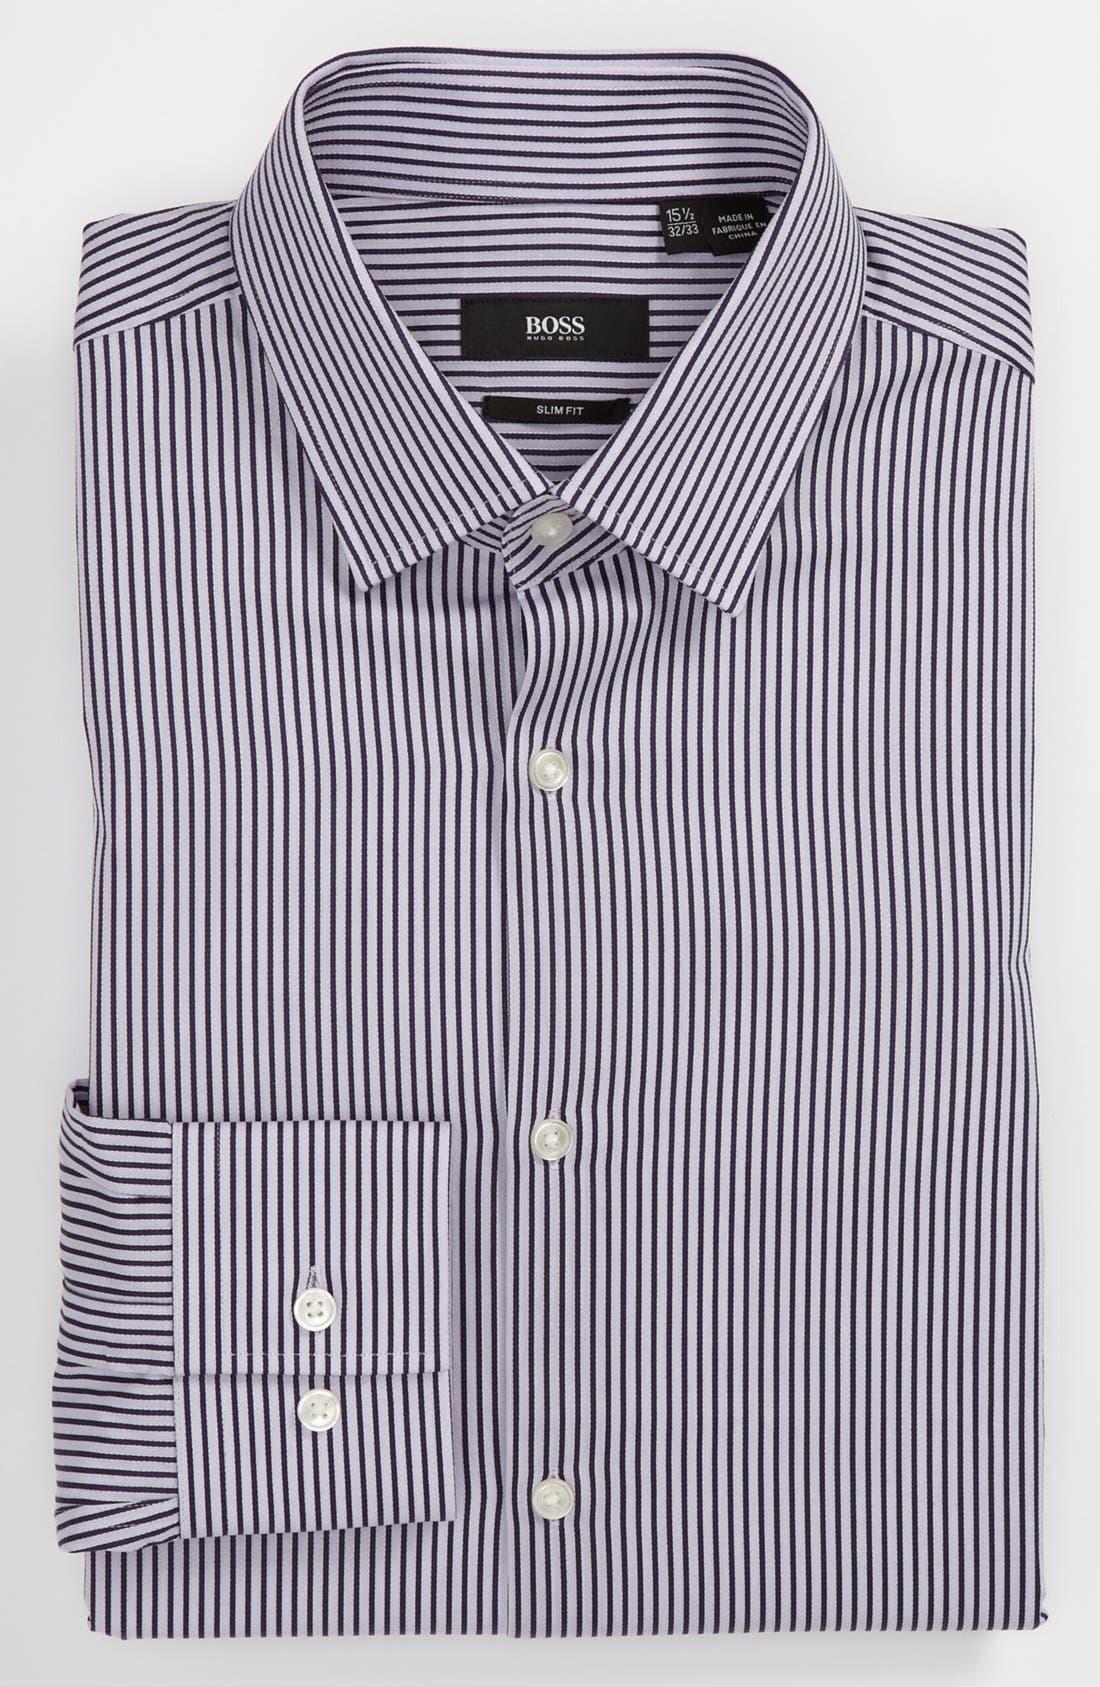 Alternate Image 1 Selected - BOSS Black Slim Fit Dress Shirt